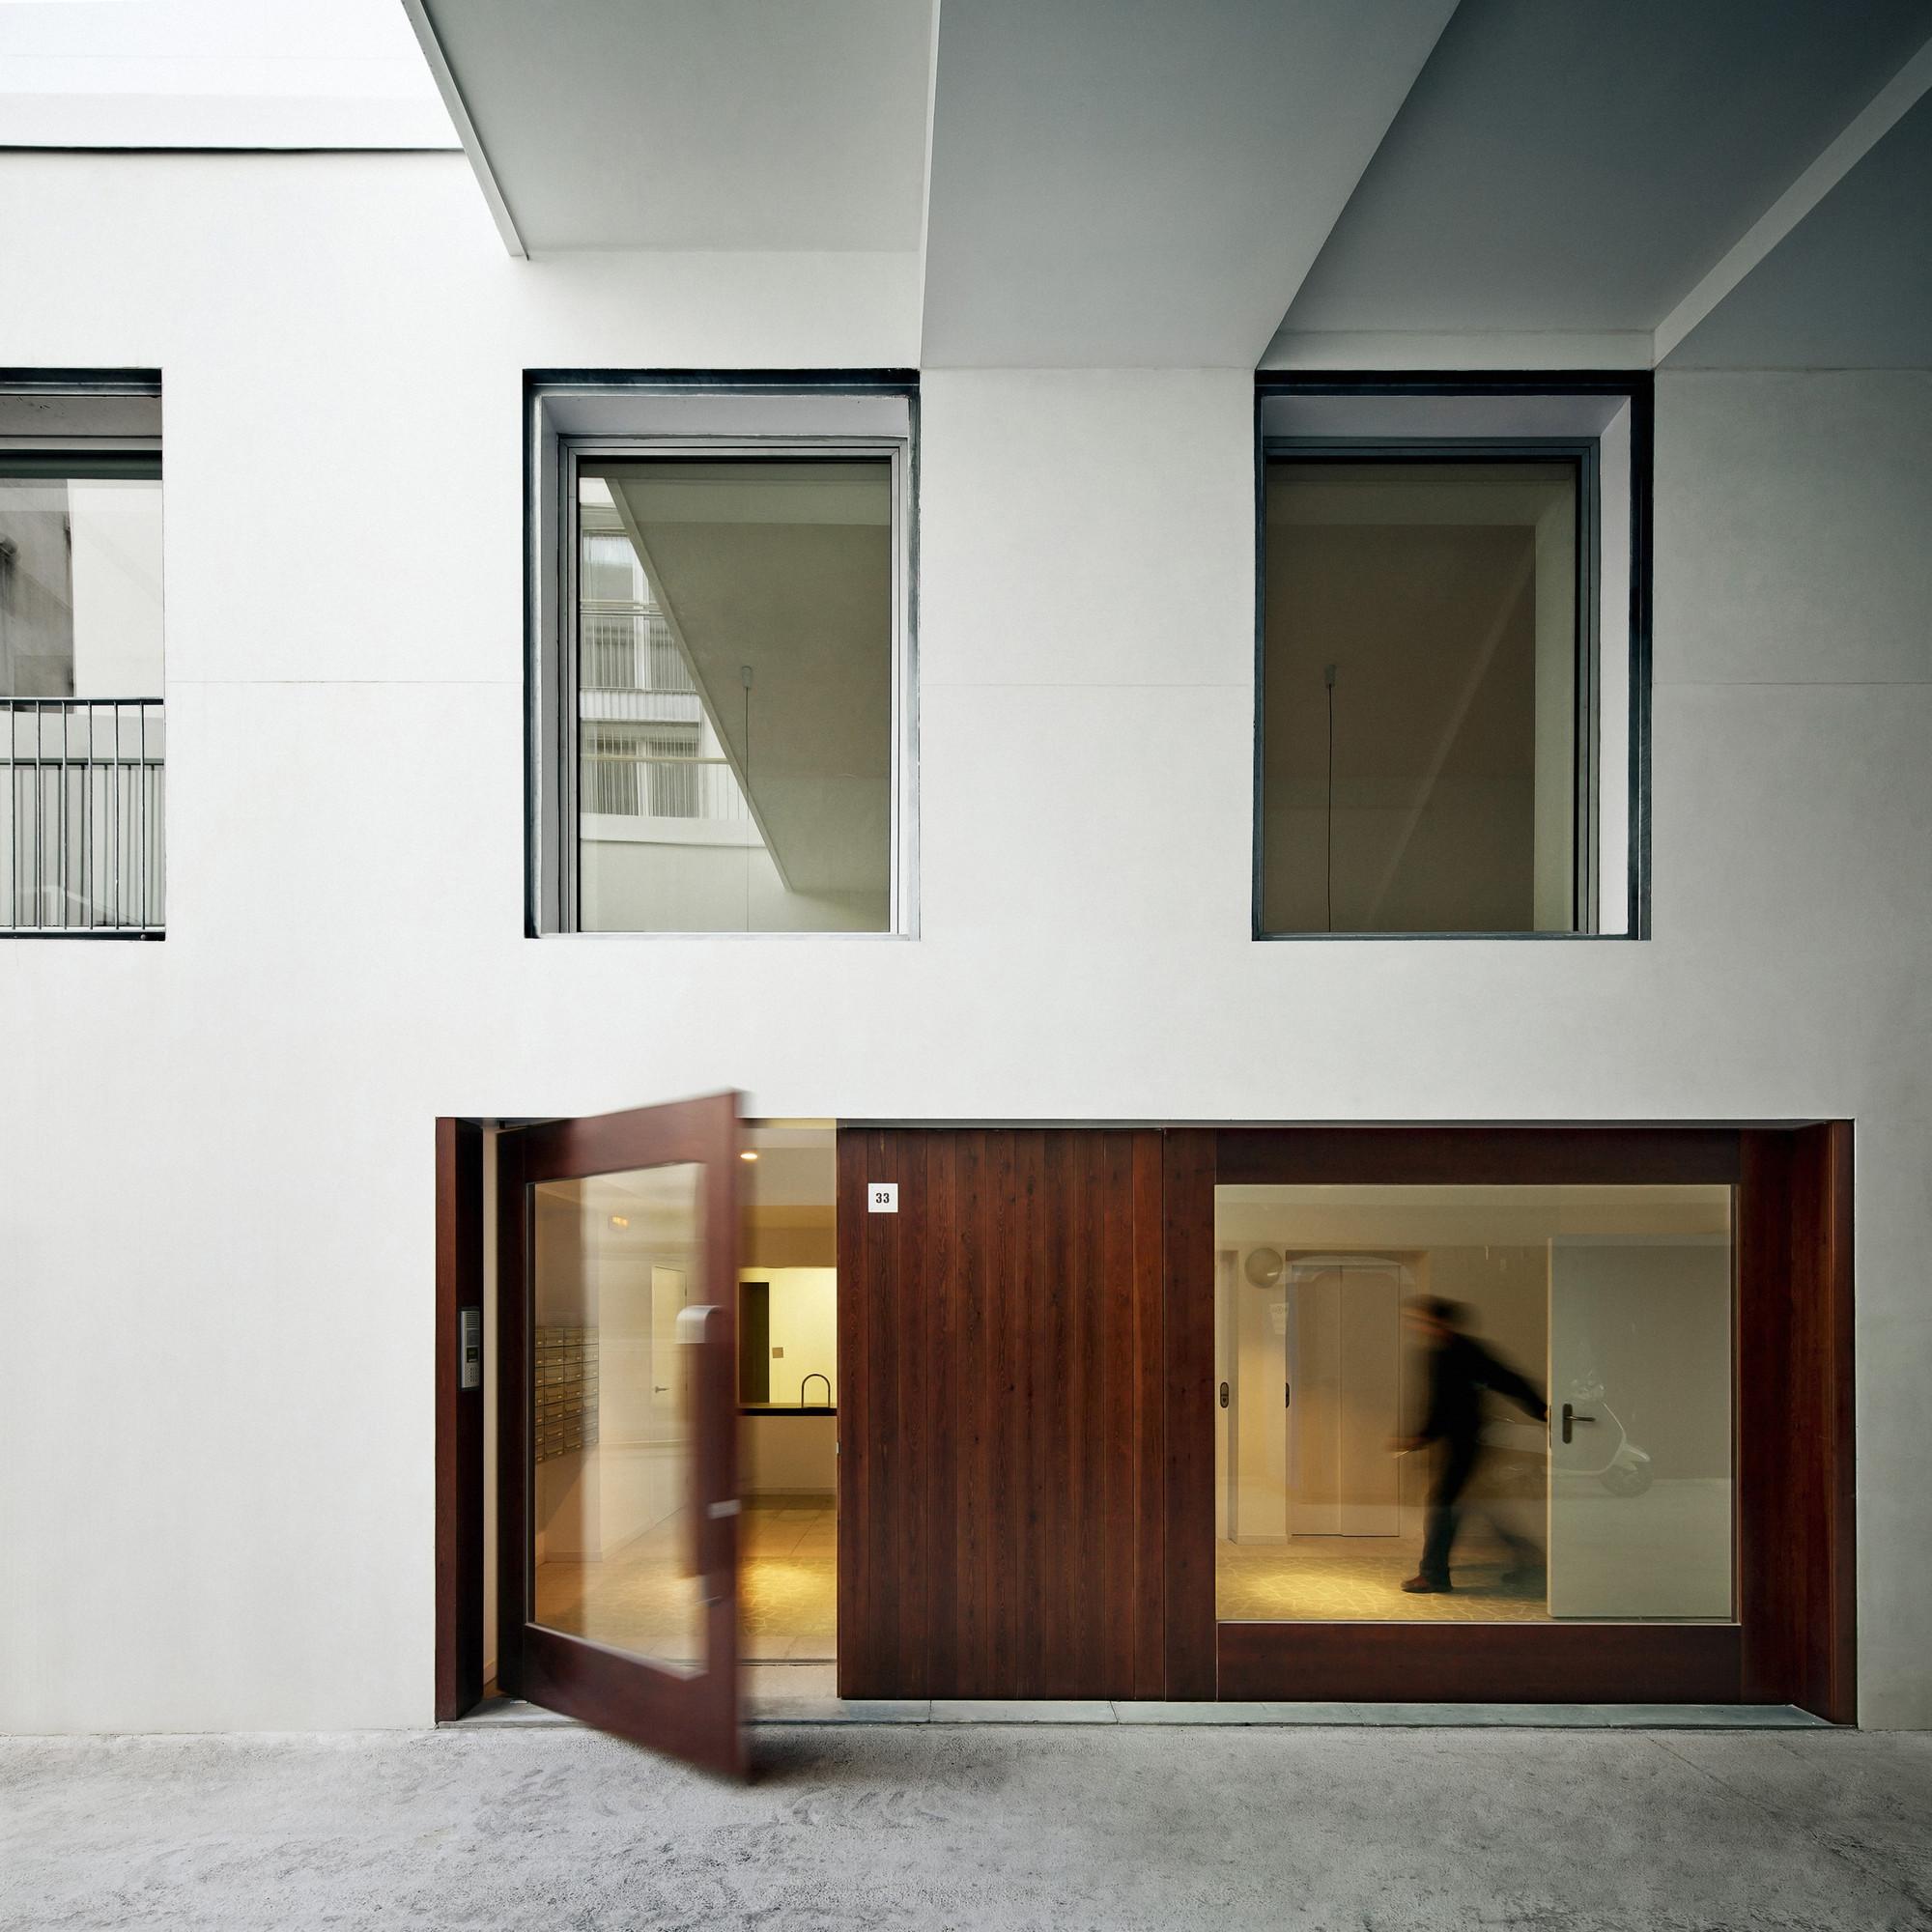 127 Subsidized Dwellings in Barcelona / Bru Lacomba Setoain, © Jordi Surroca